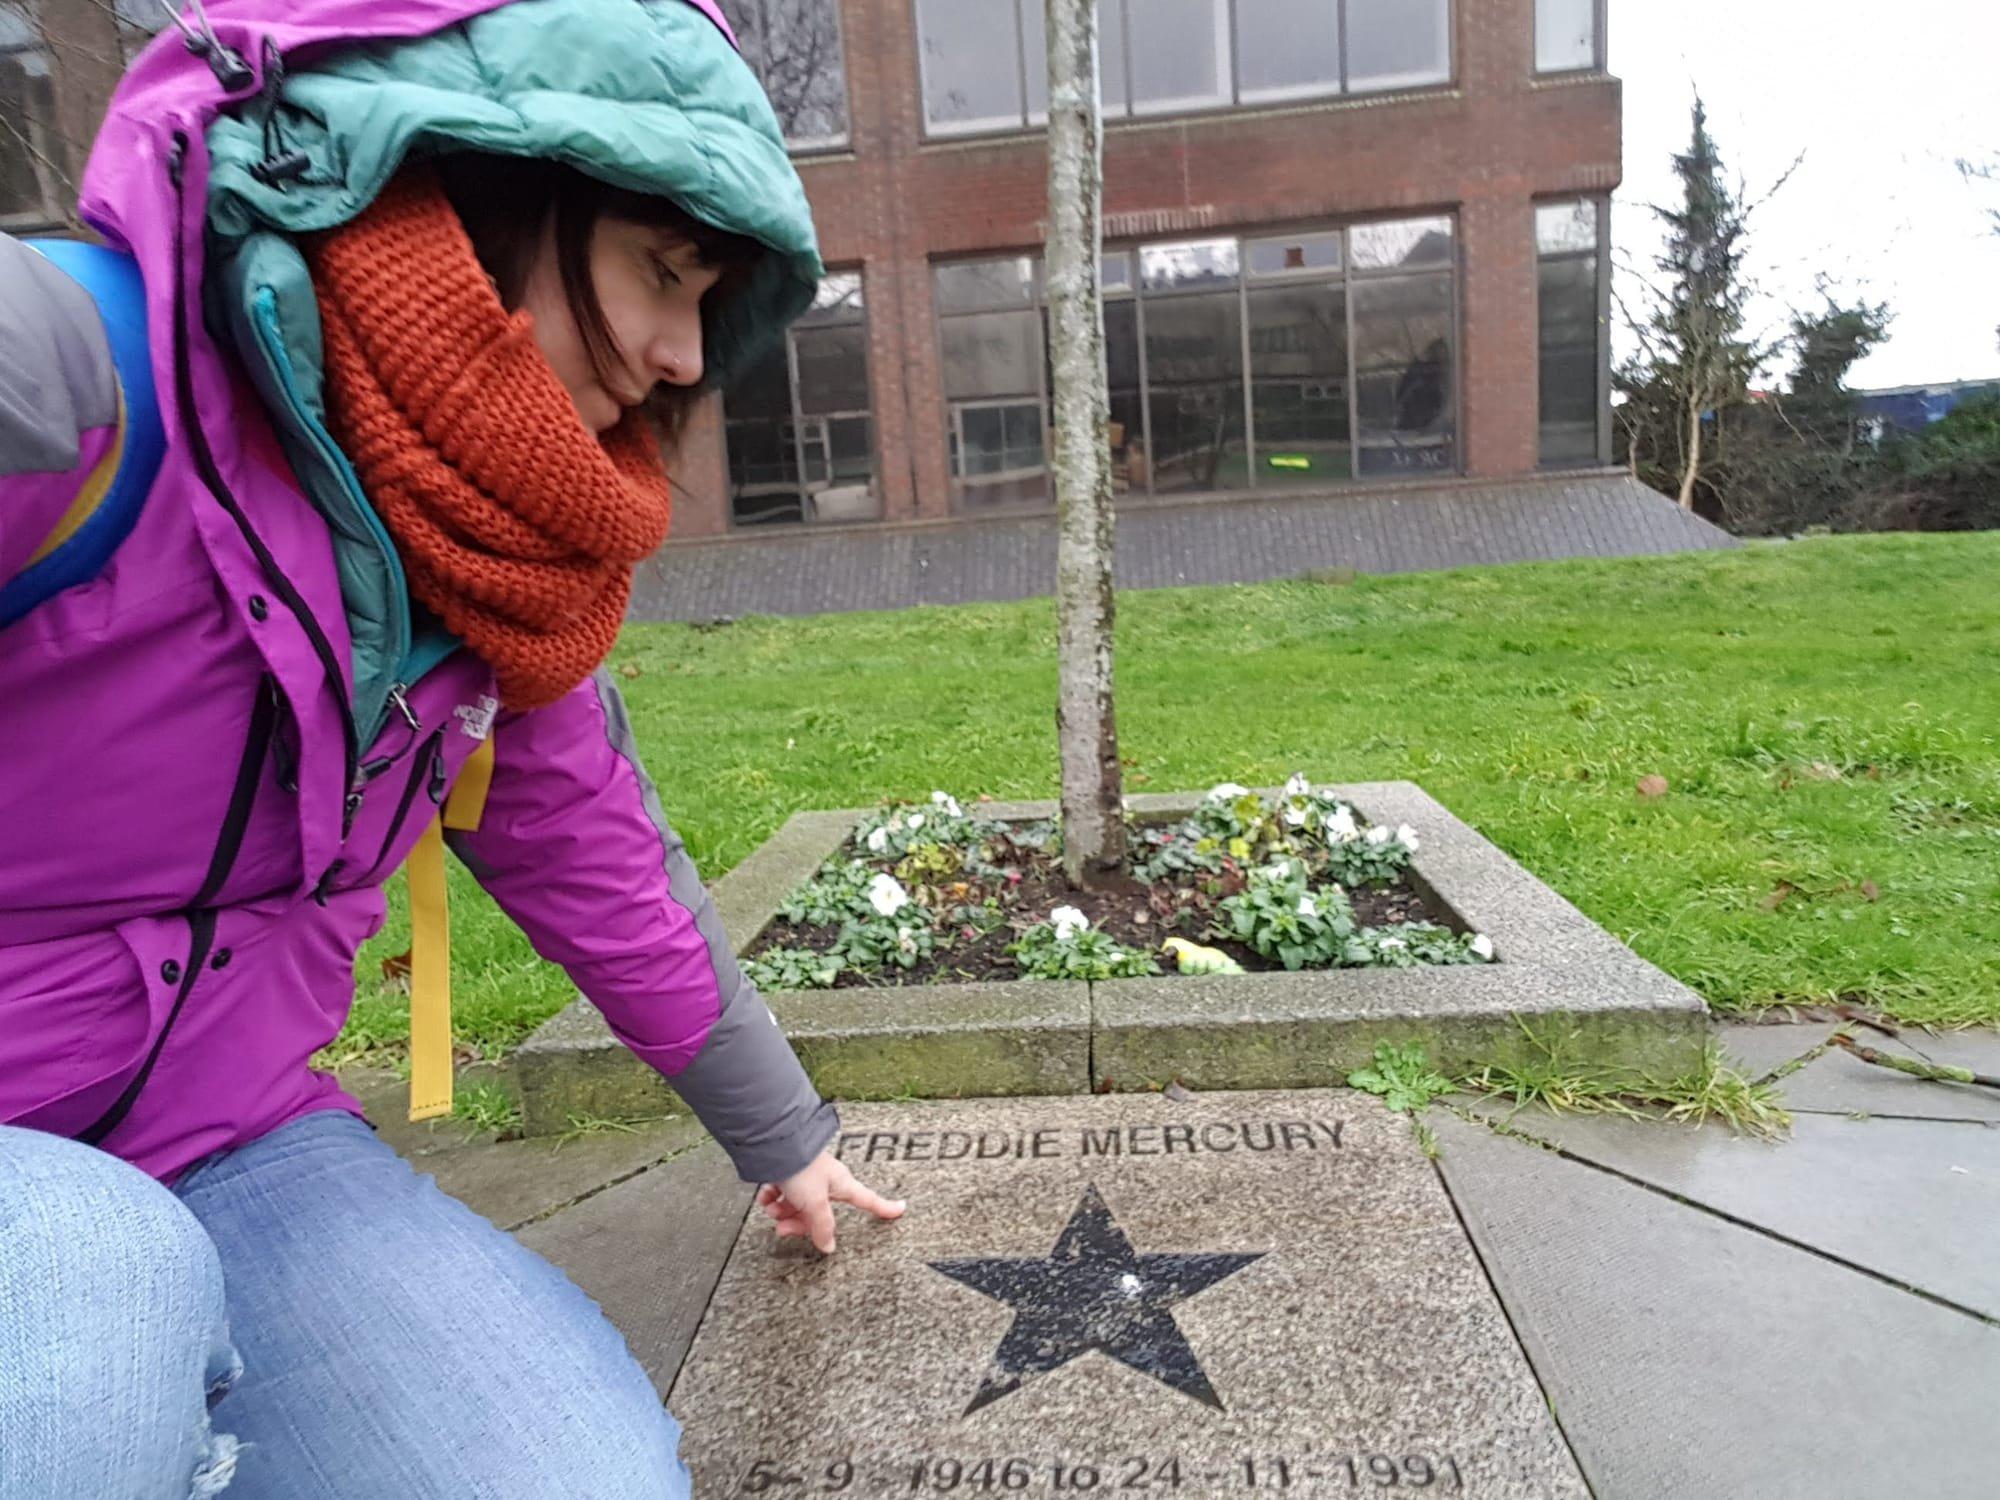 freddie mercury memorial feltham